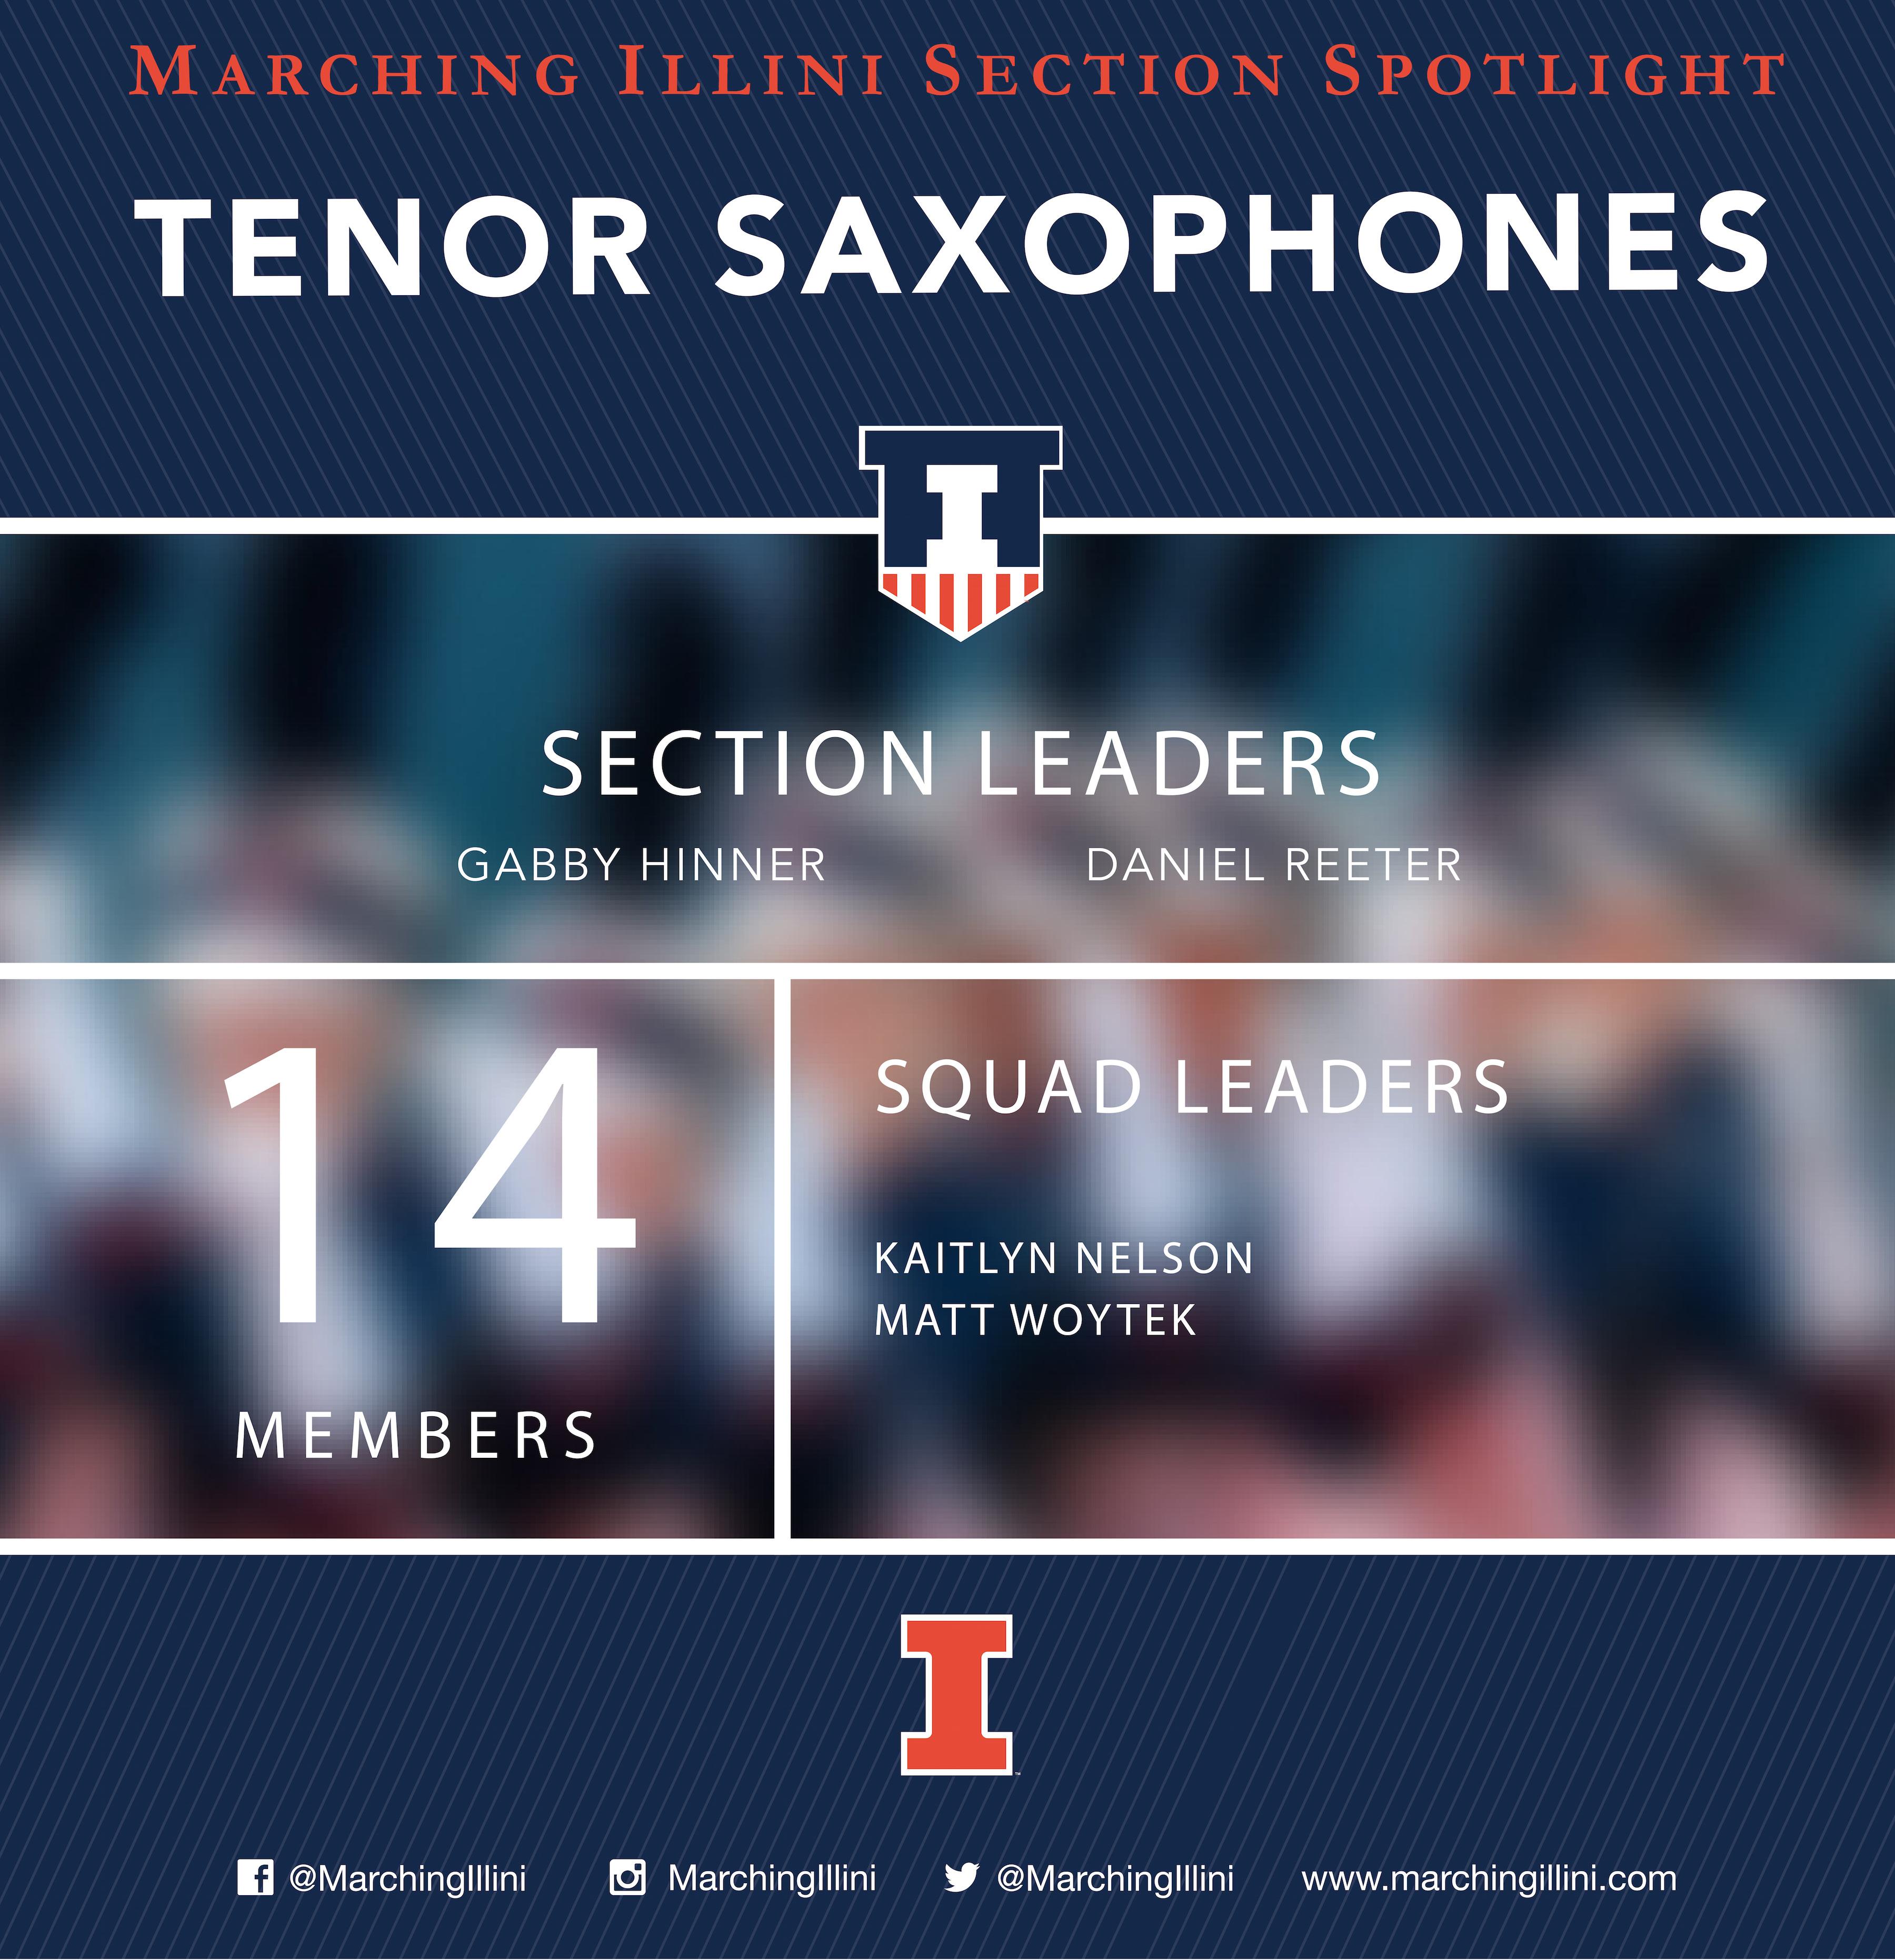 section-spotlight-tenor-saxophones